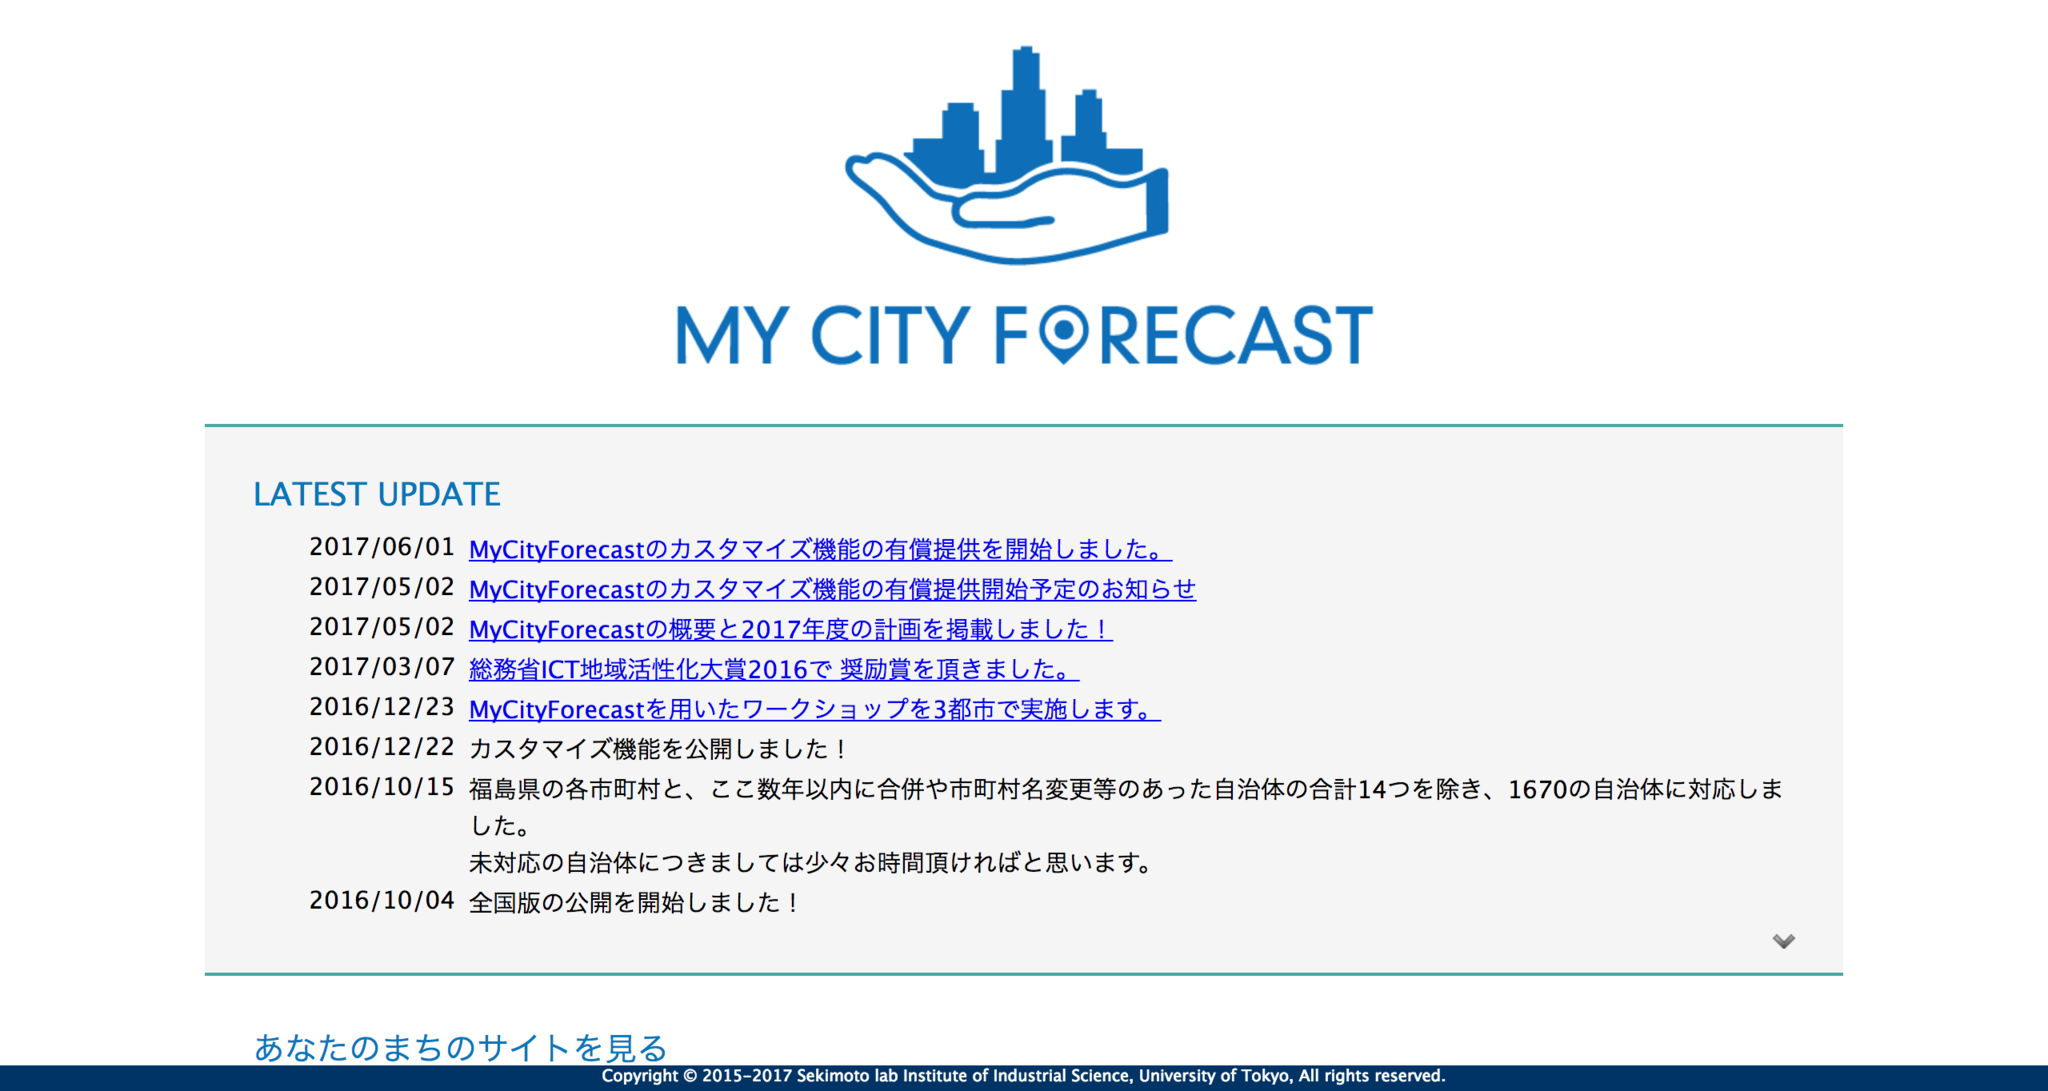 My_City_Forecast_あなたのまちの未来予報.png